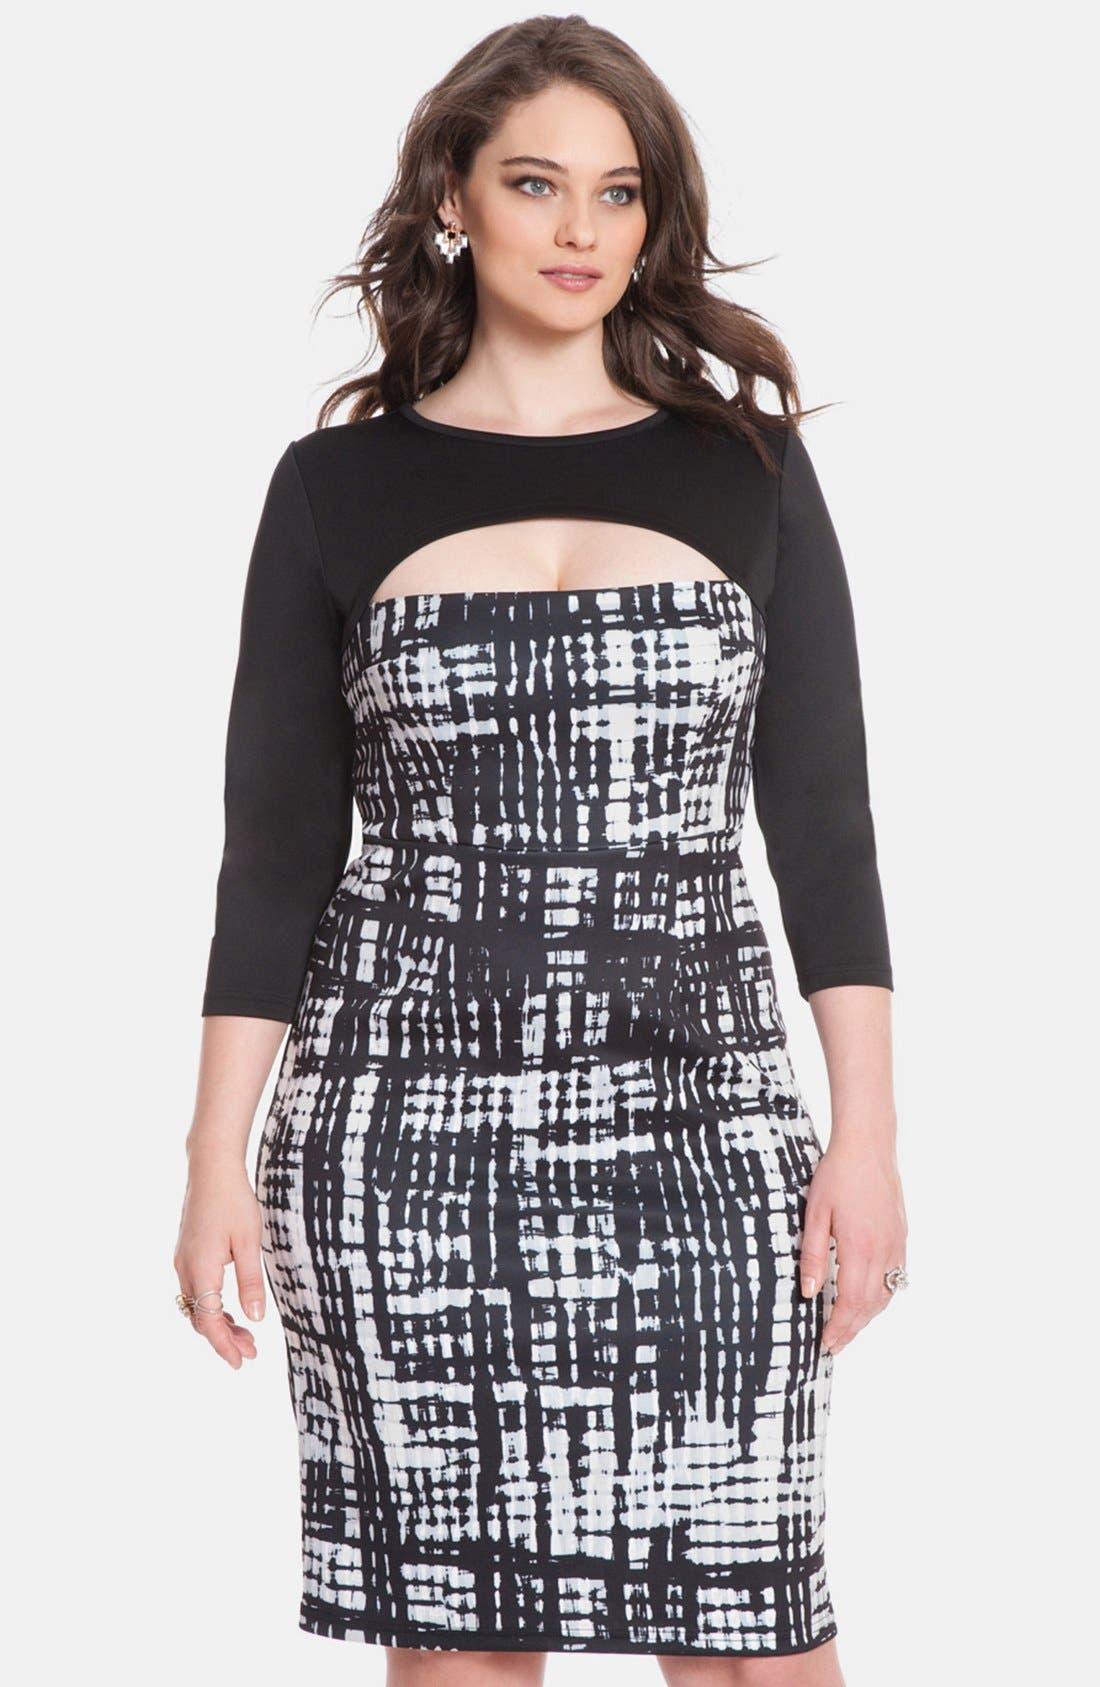 Alternate Image 1 Selected - ELOQUII Print Block Cutout Dress (Plus Size)